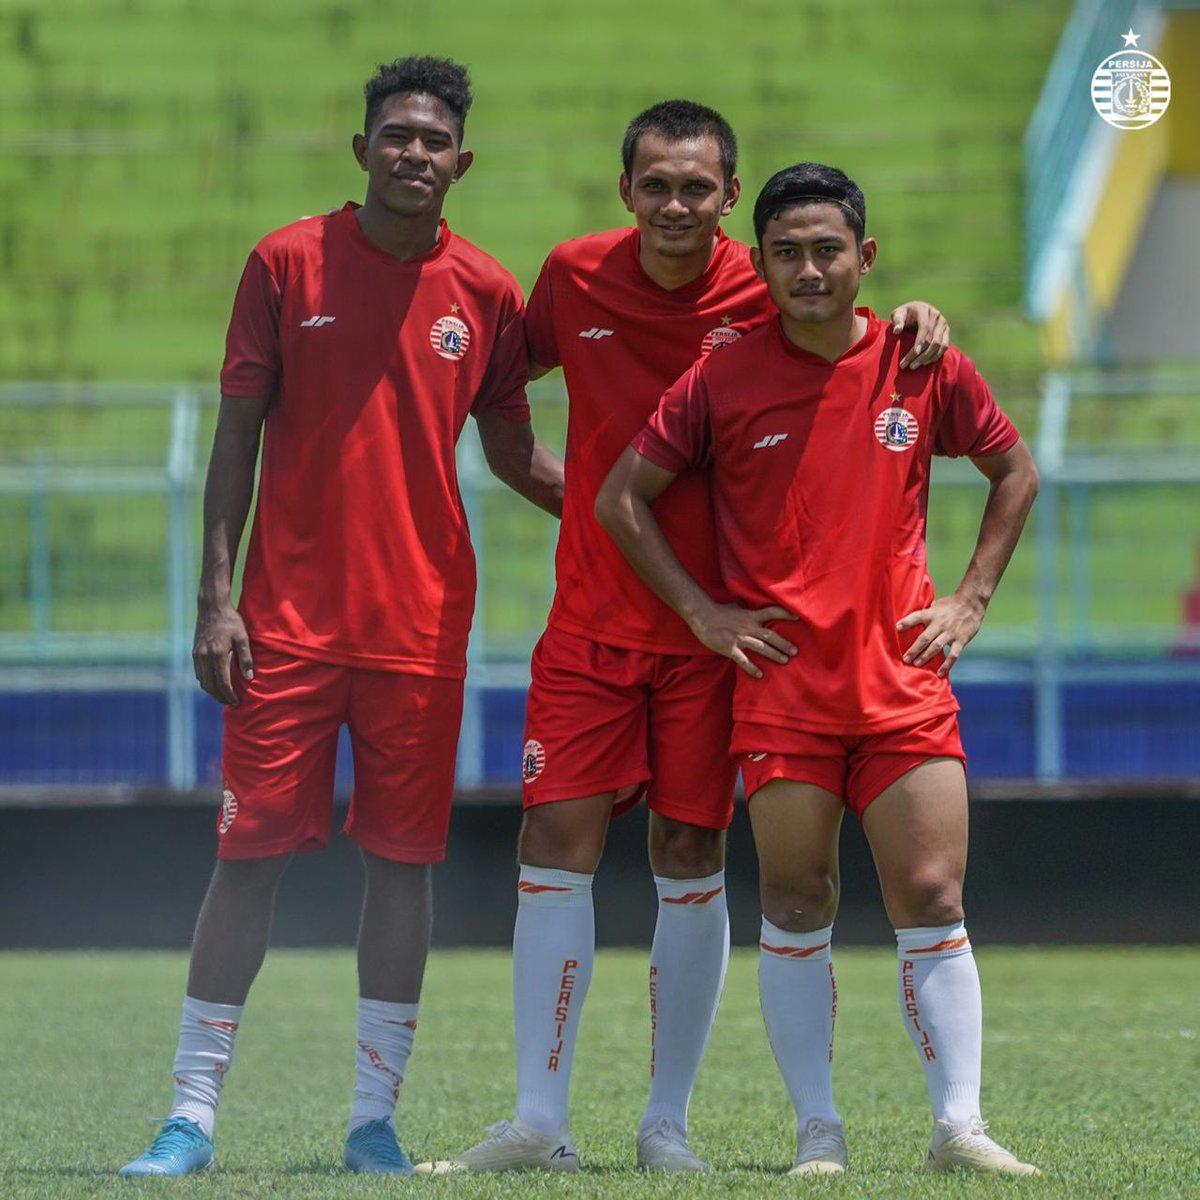 Senyuman siapa yang paling manis dari ketiga pemain ini, Jak? 😊🐯  #ThursdayMood #BelieveIn12 #PersijaJakarta https://t.co/drrXcPg5mp